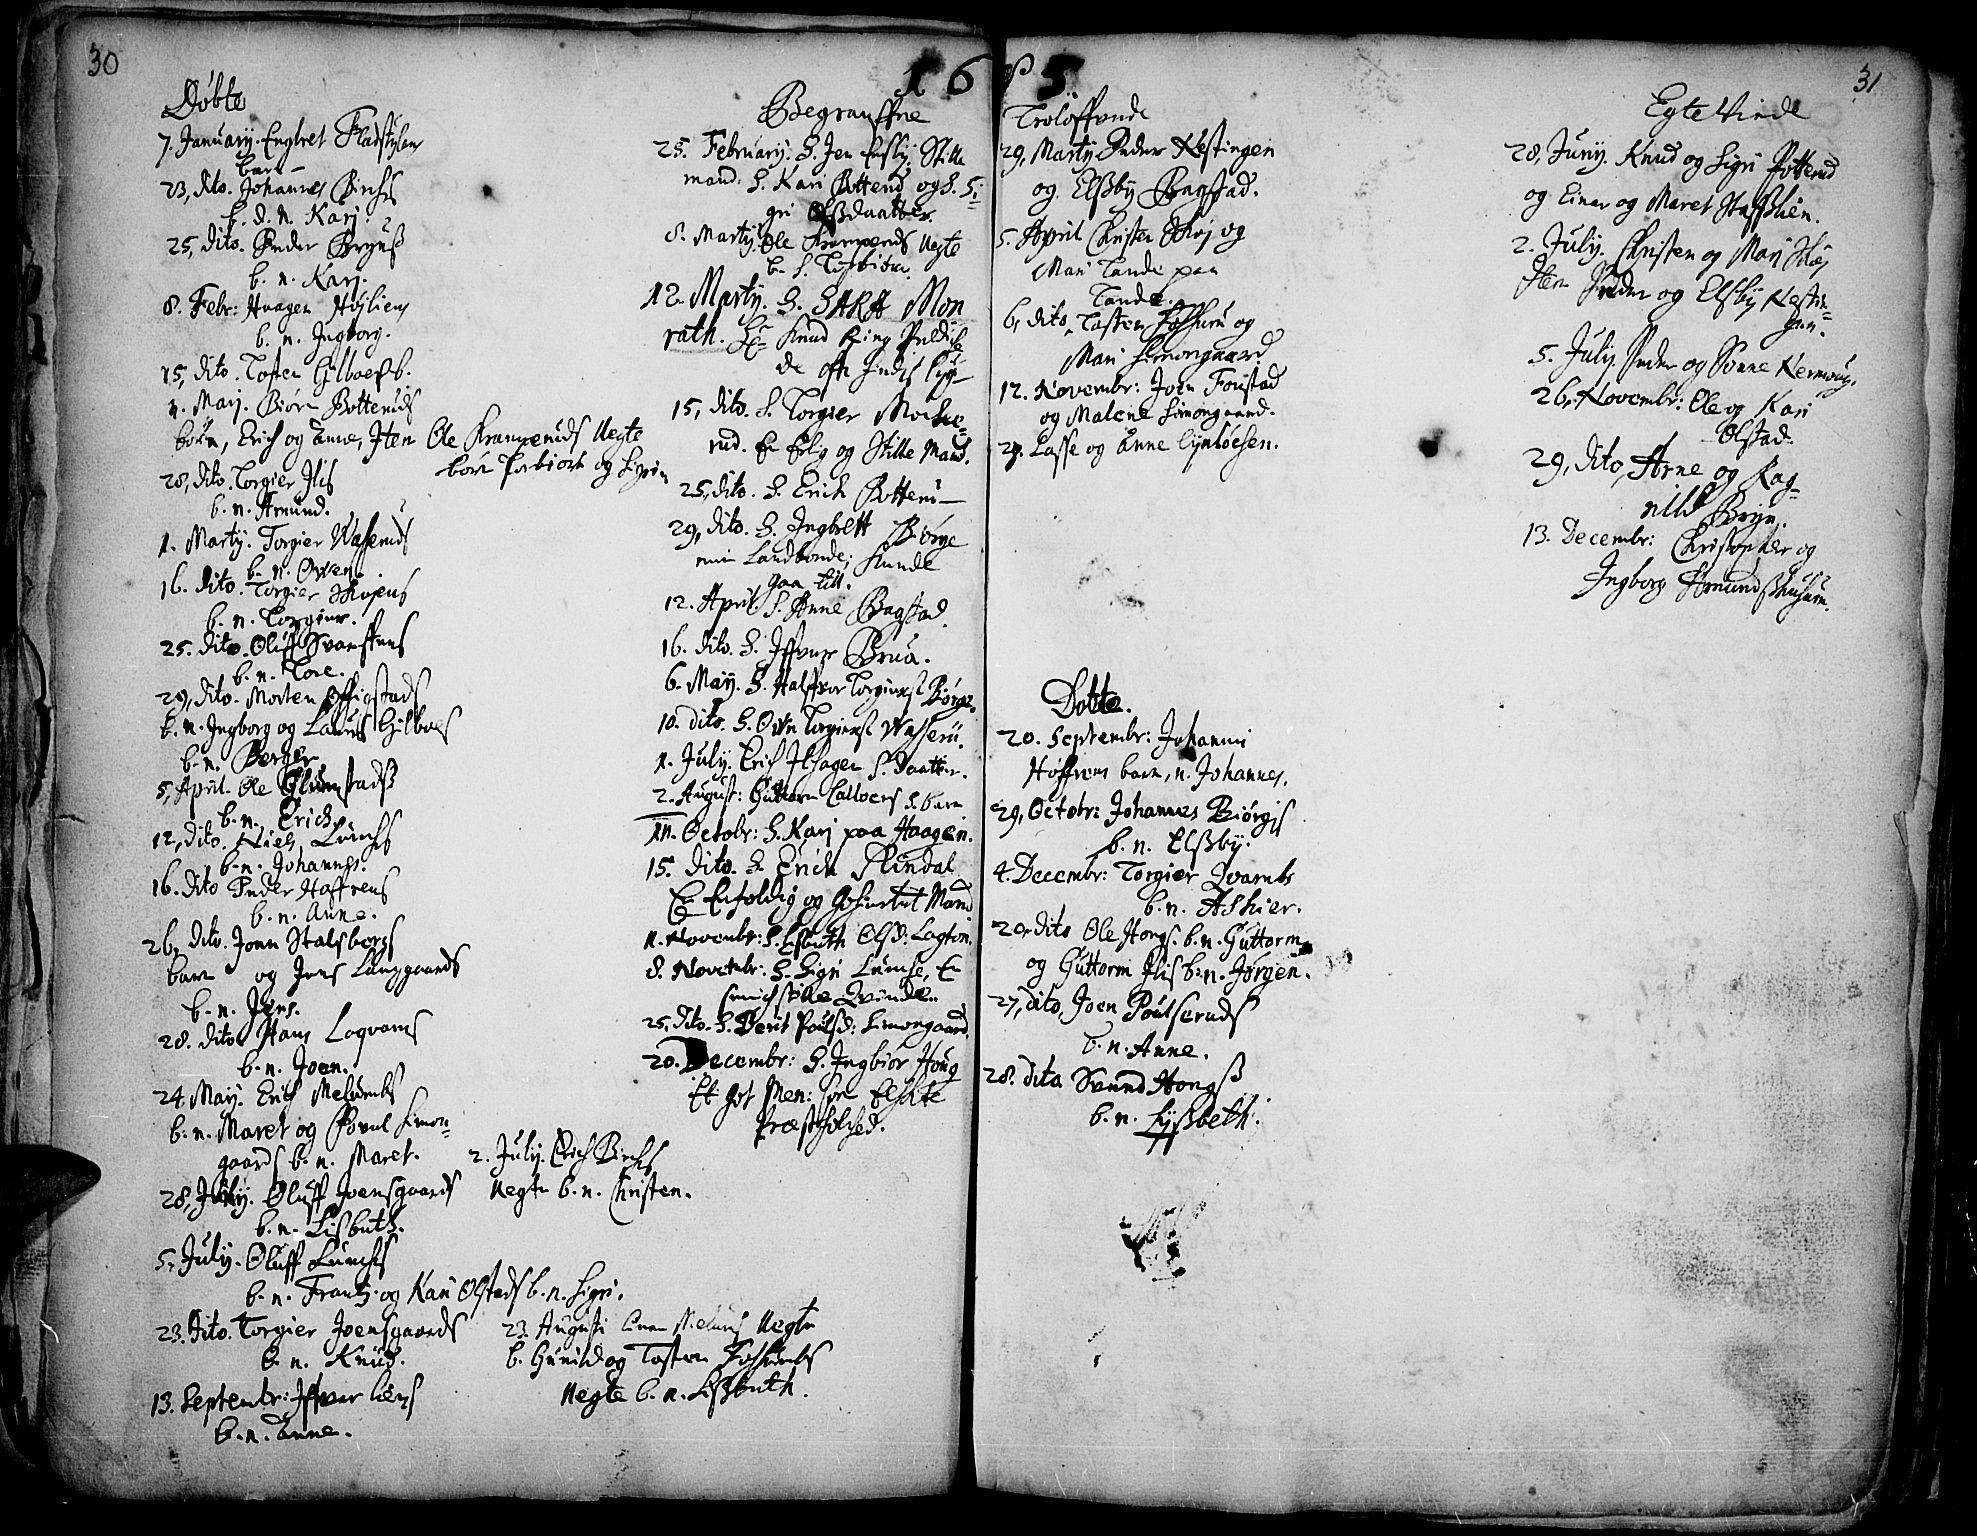 SAH, Øyer prestekontor, Ministerialbok nr. 1, 1671-1727, s. 30-31